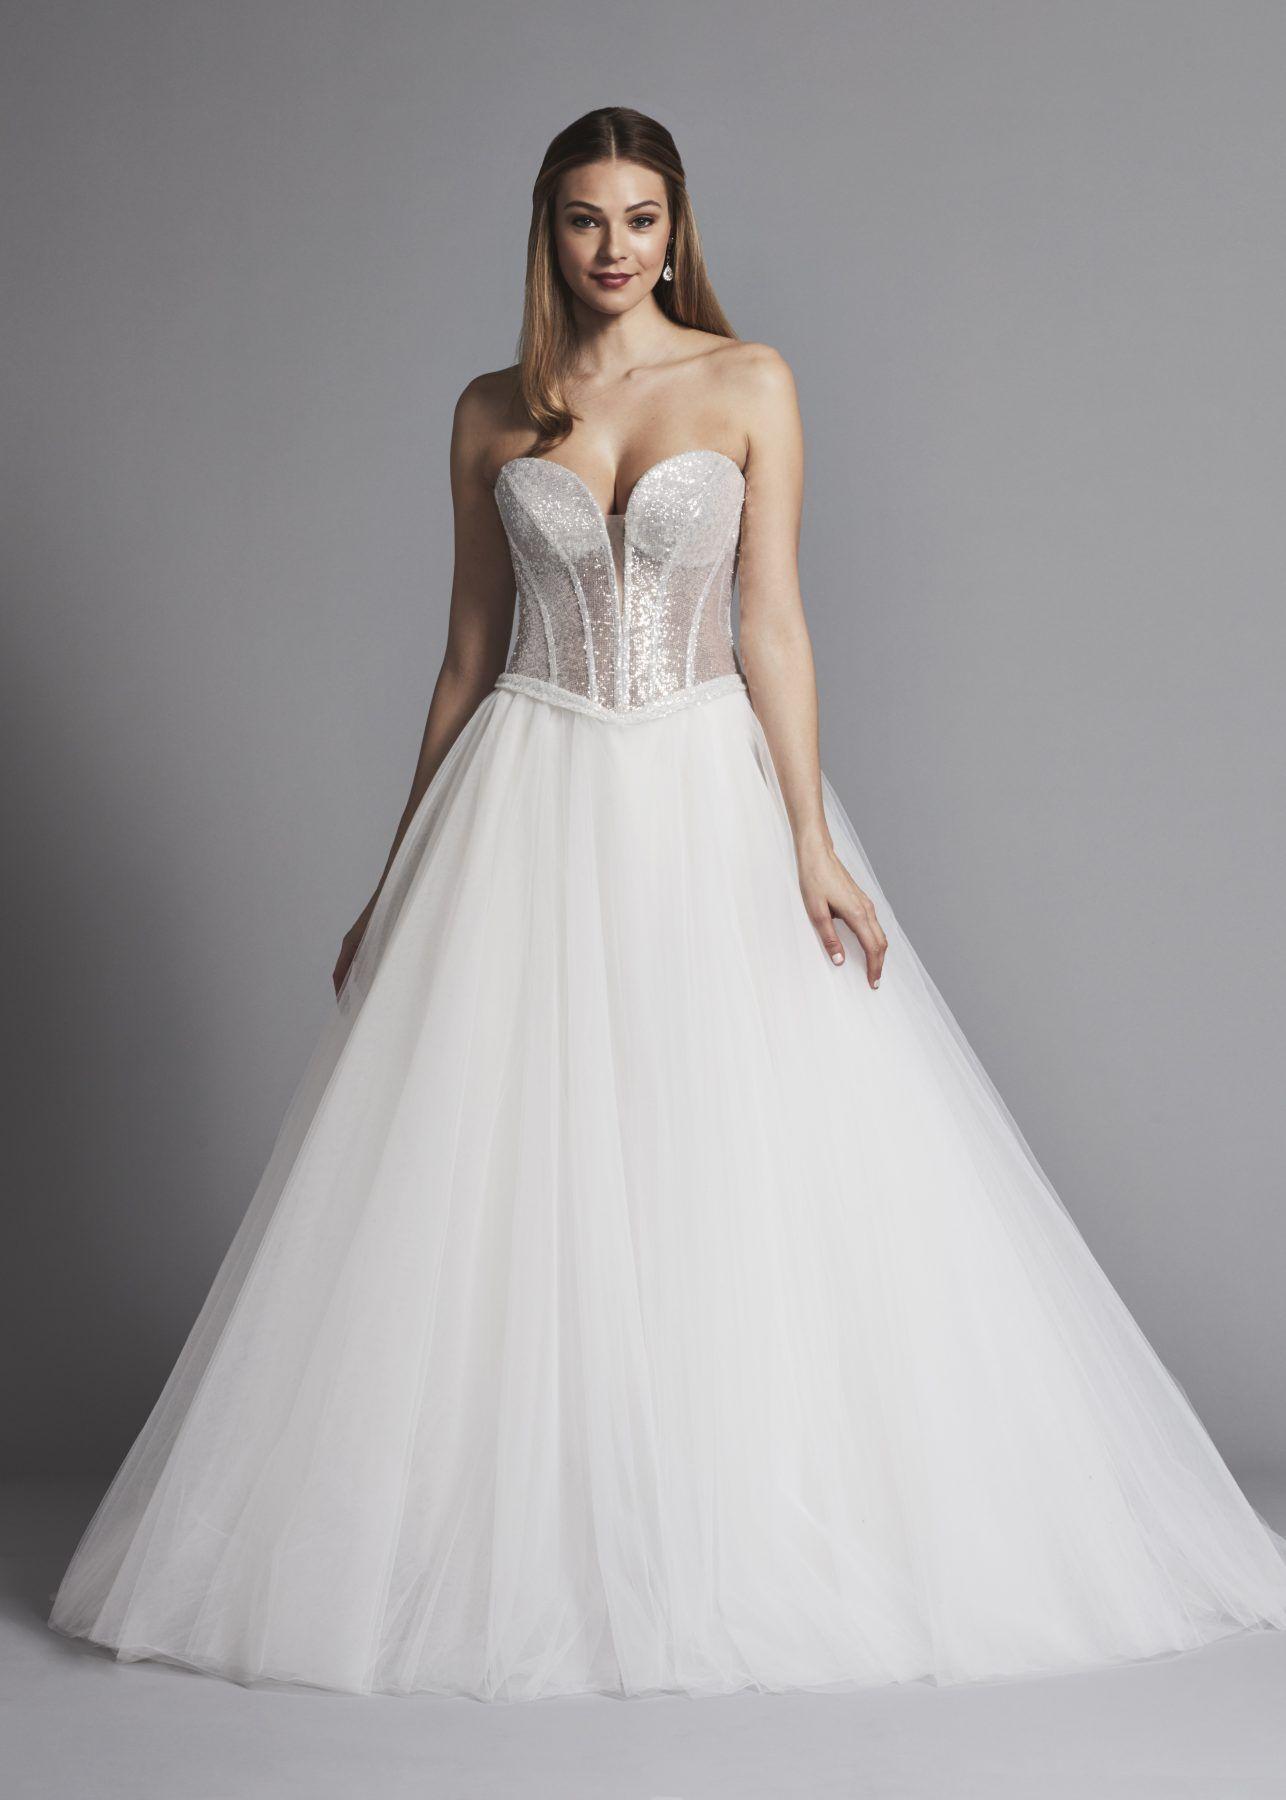 Glitter strapless ball gown wedding dress with tulle skirt